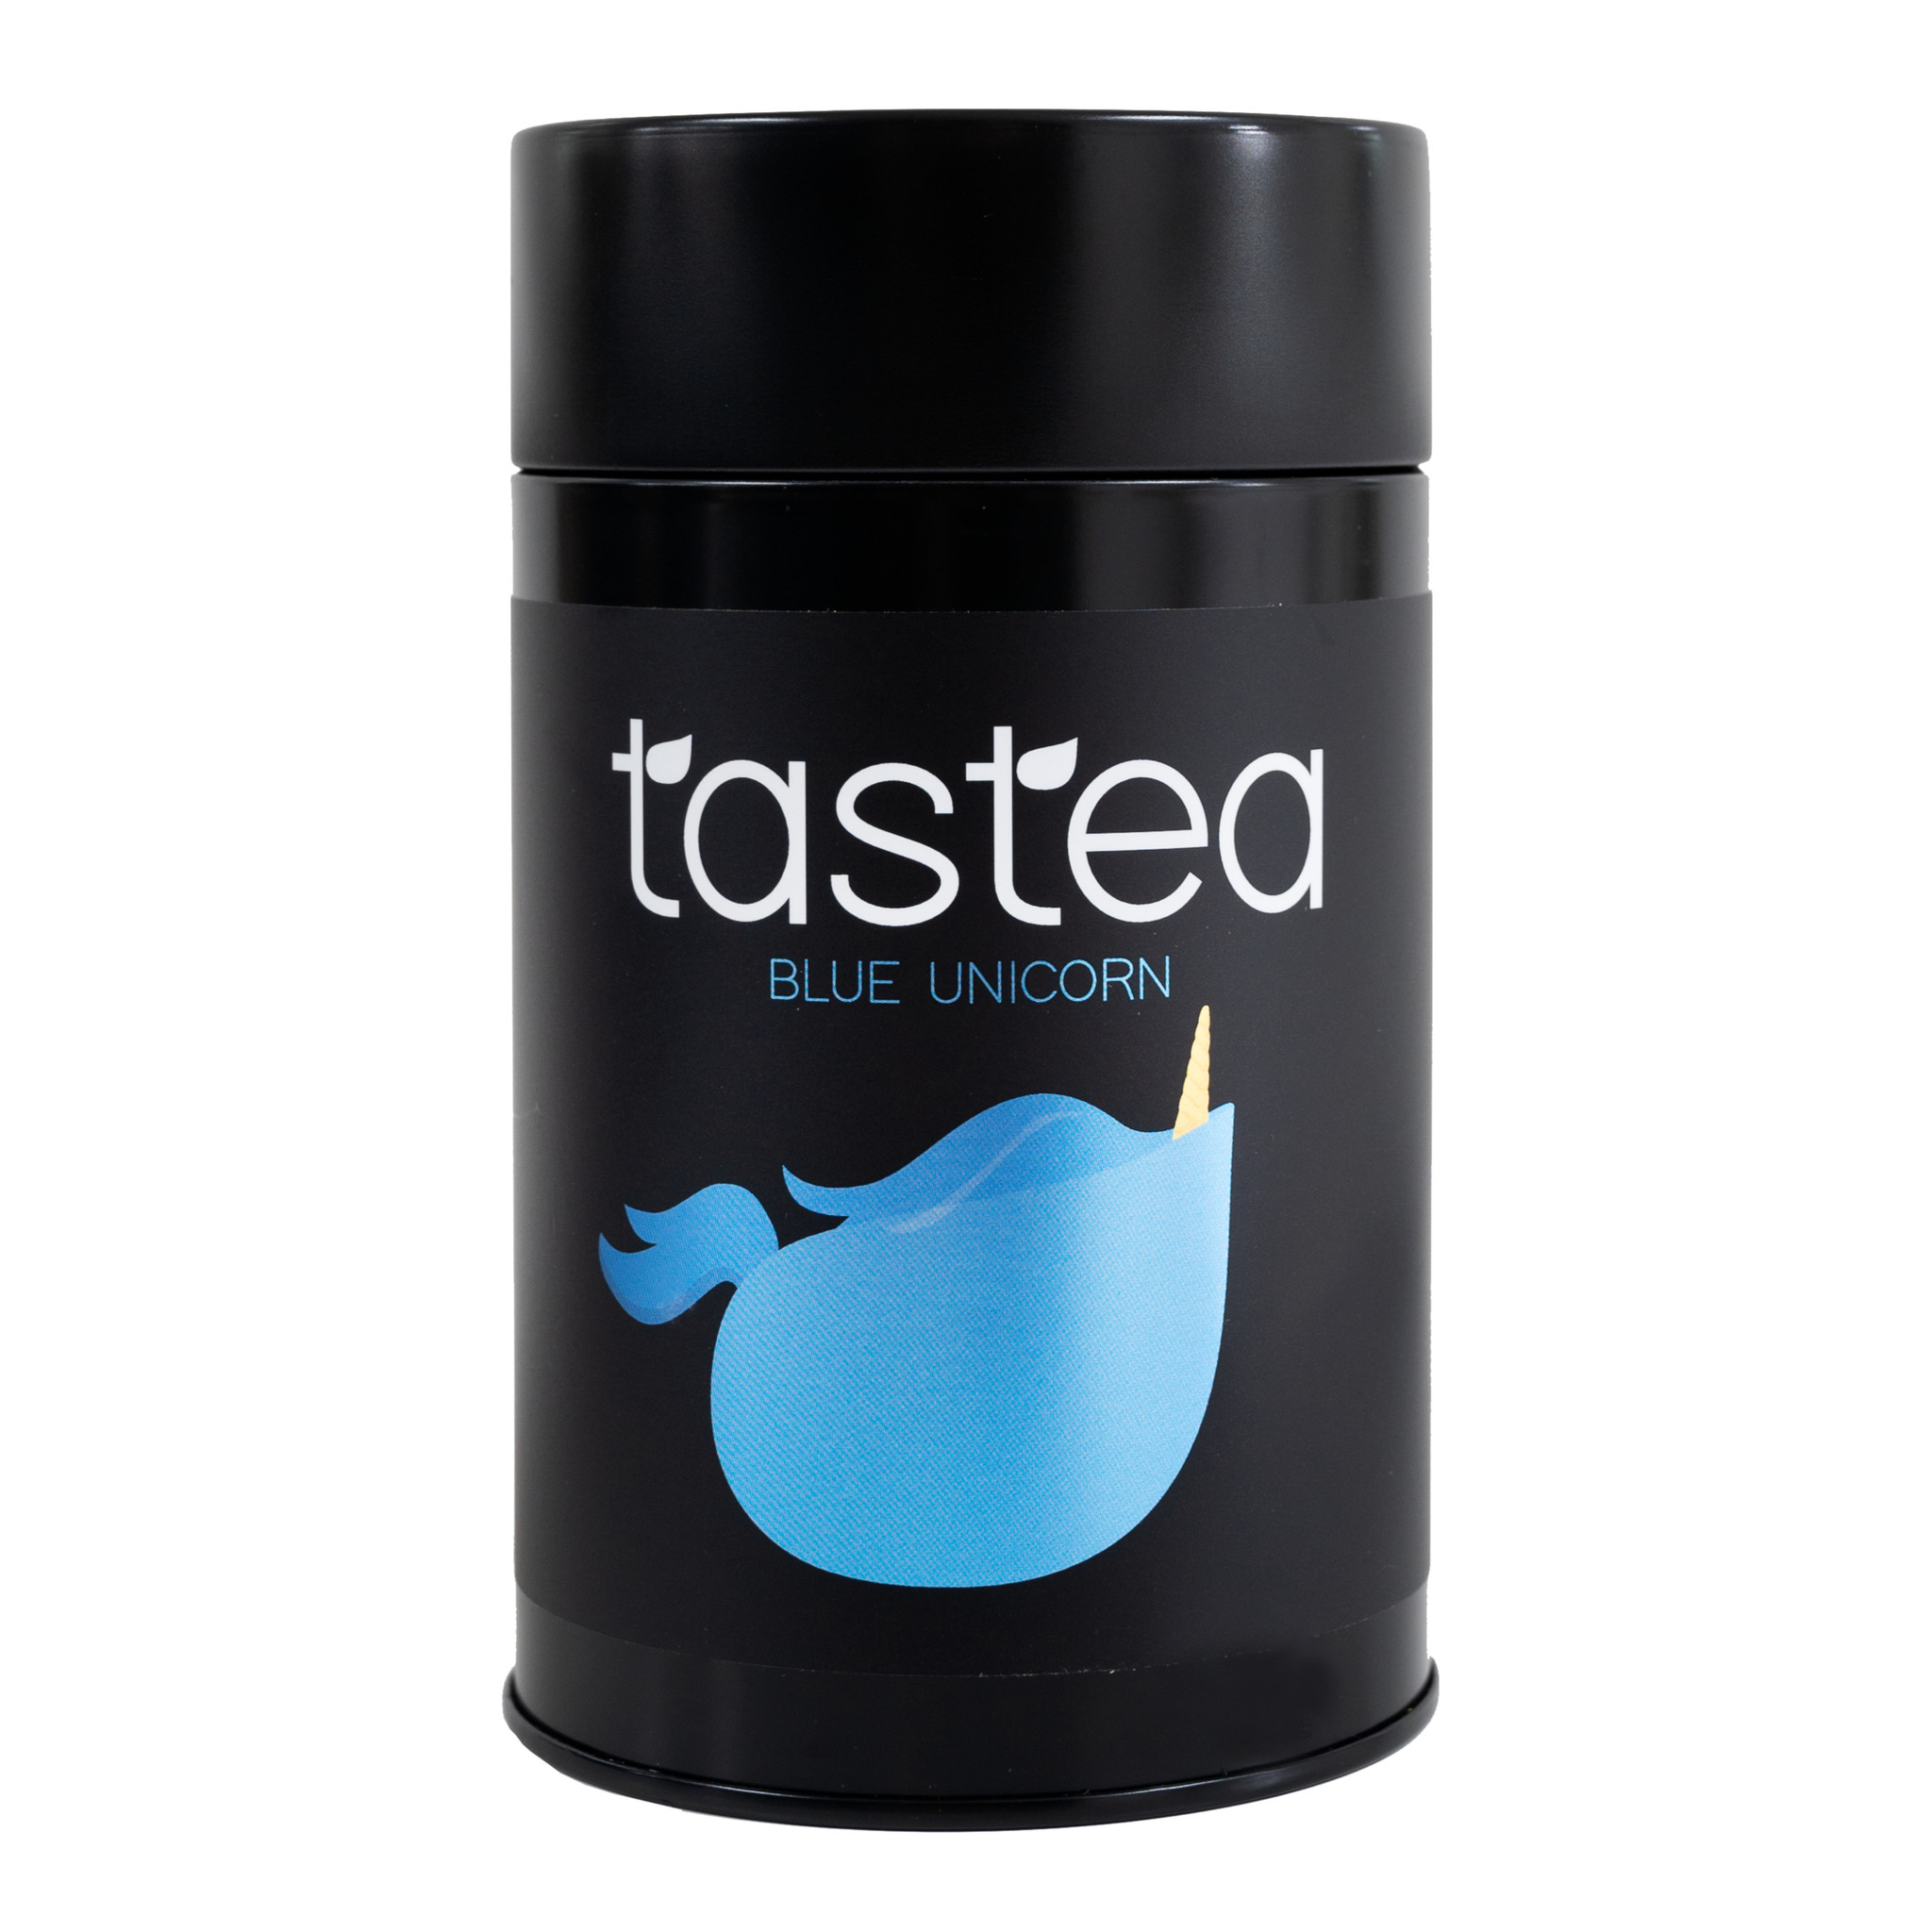 Tastea Blue Unicorn thee 100 gram